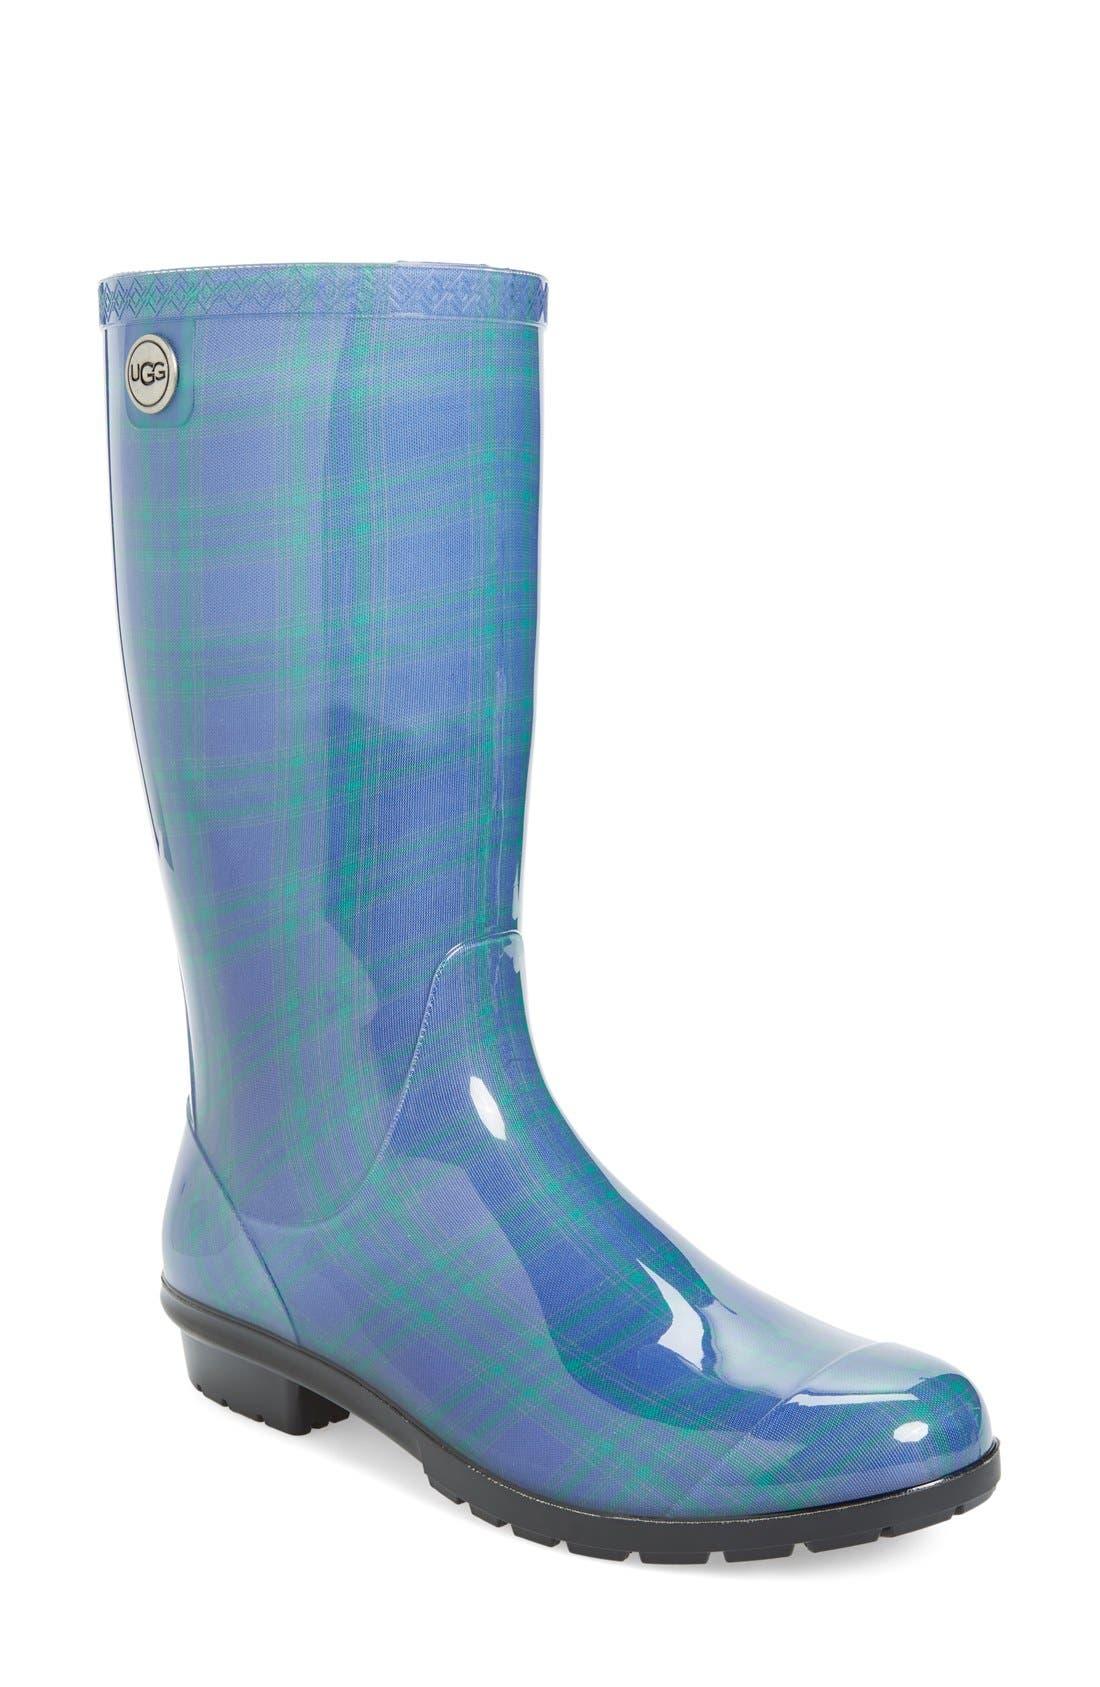 Alternate Image 1 Selected - UGG® 'Shaye' Genuine Shearling Lined Waterproof Mid-Calf Rain Boot (Women)